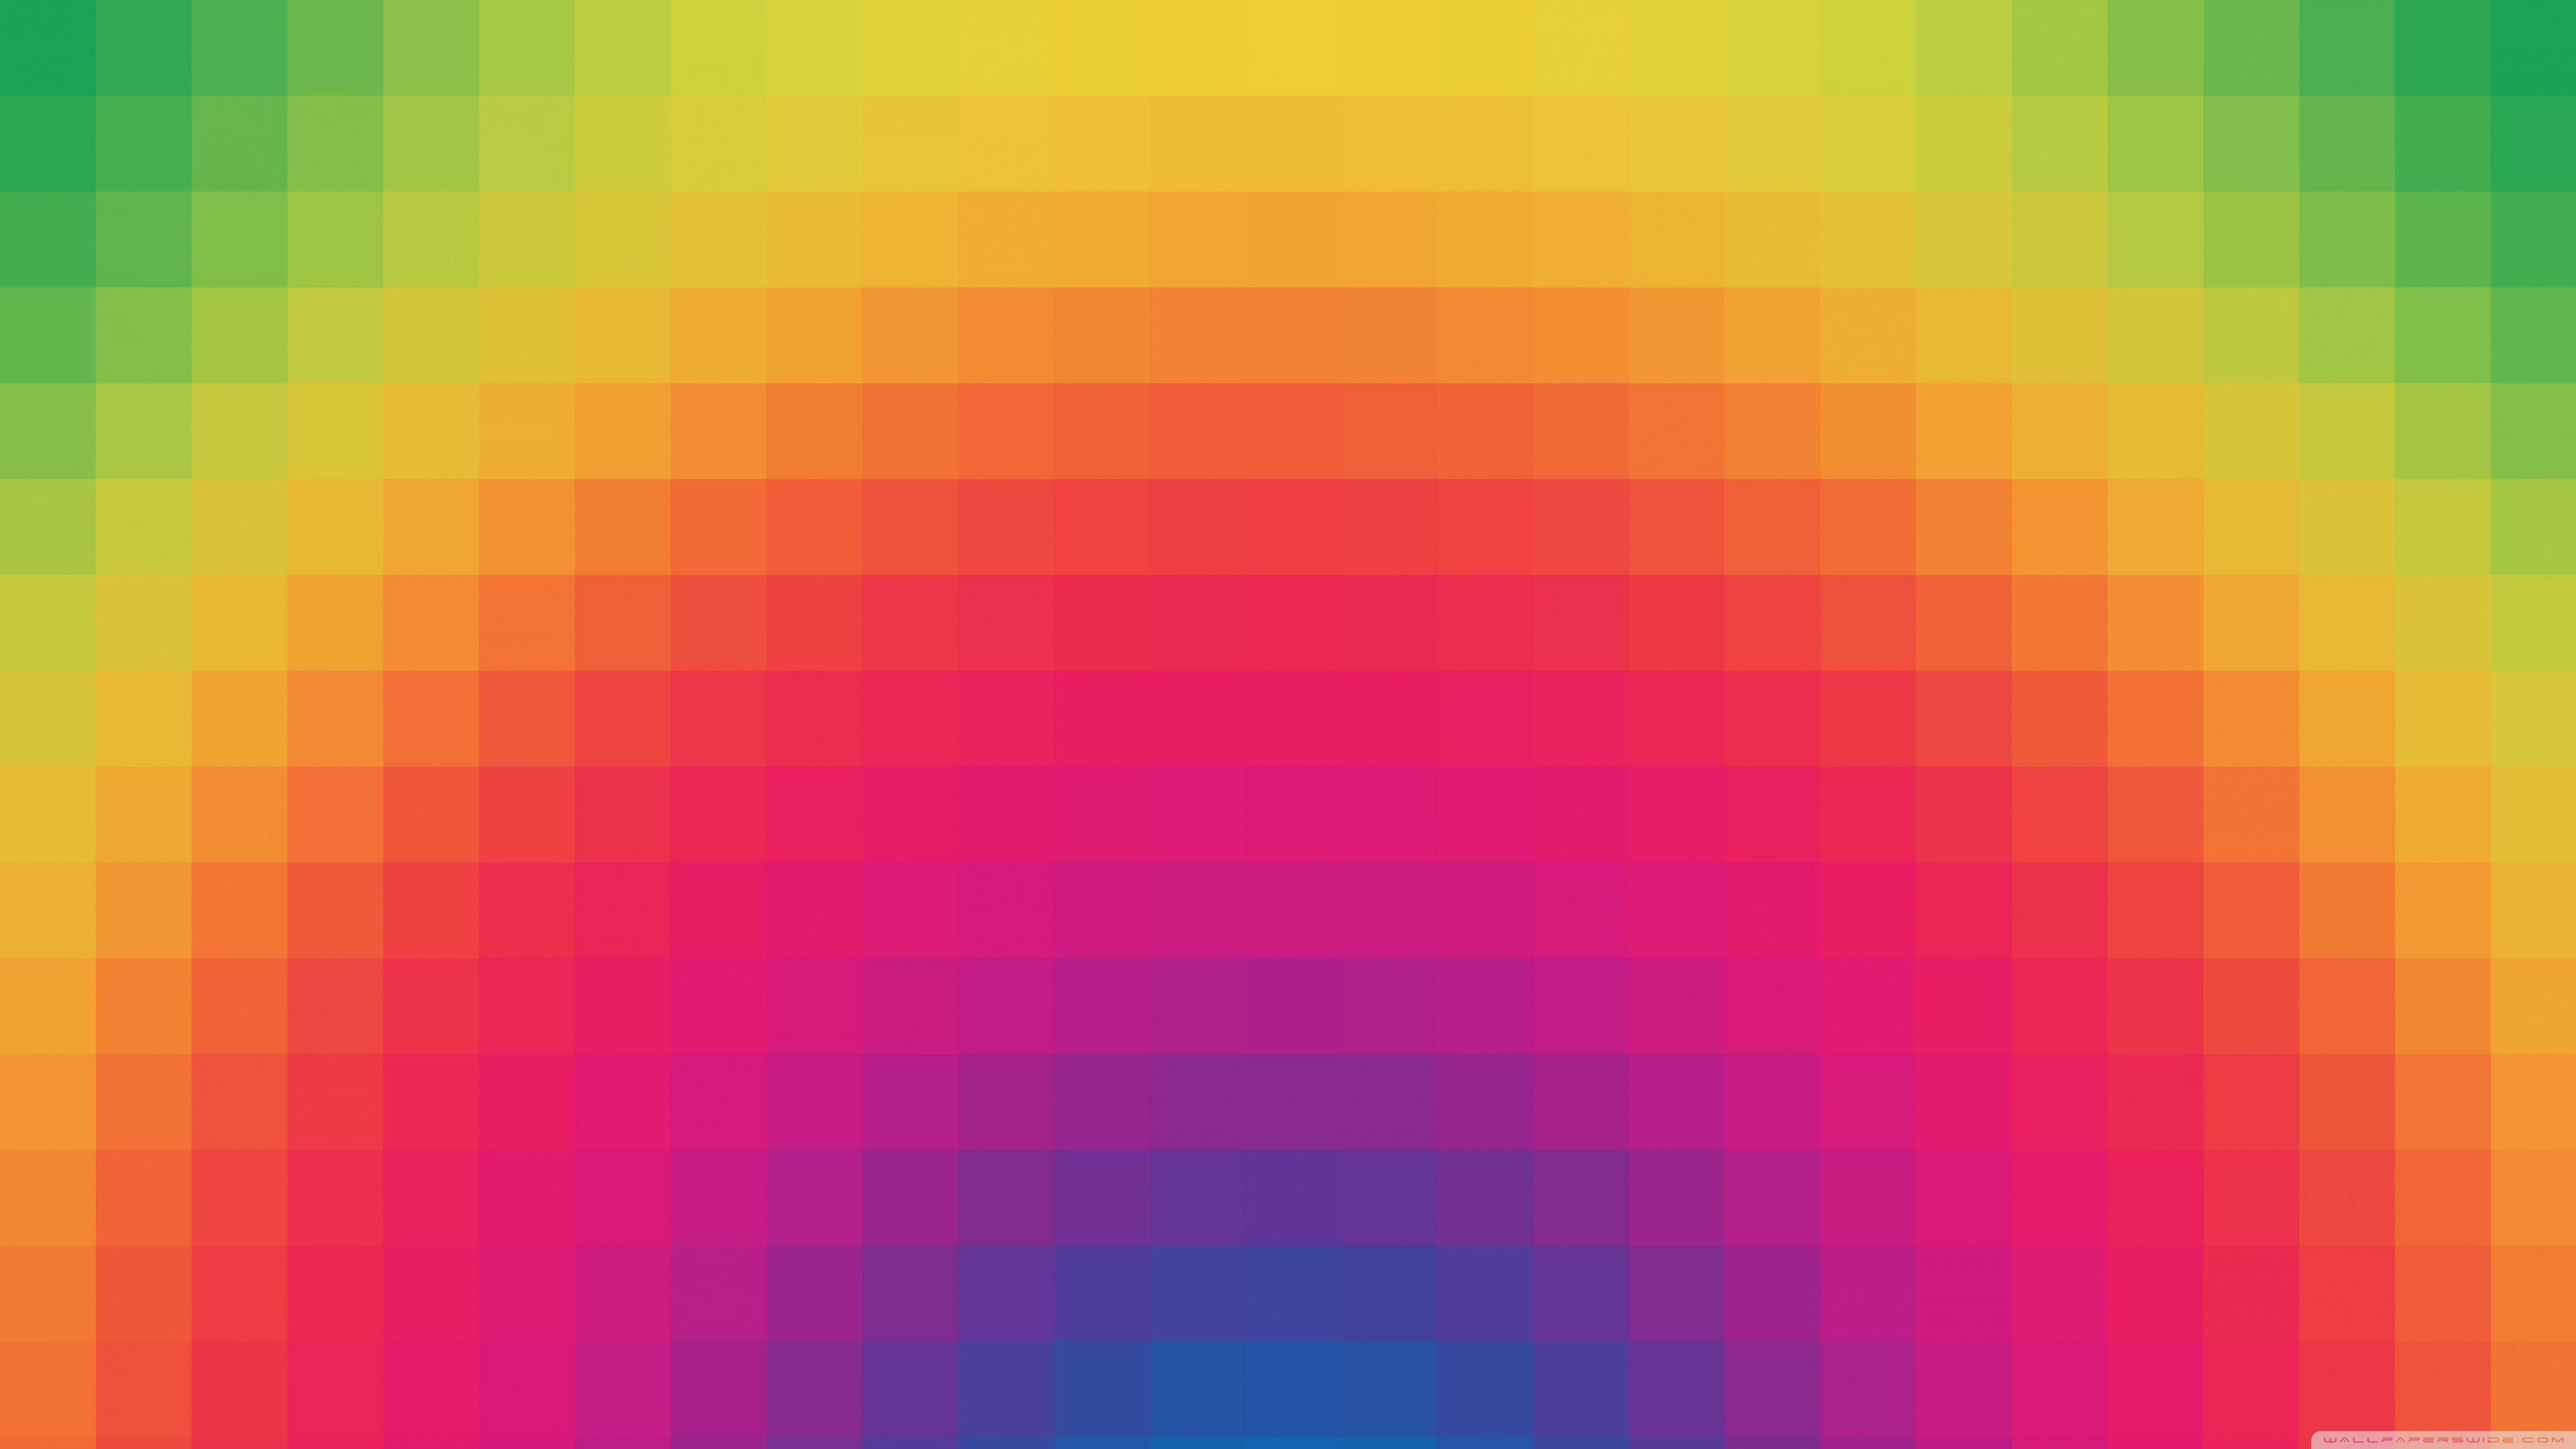 Rainbow 4k Wallpapers Top Free Rainbow 4k Backgrounds Wallpaperaccess